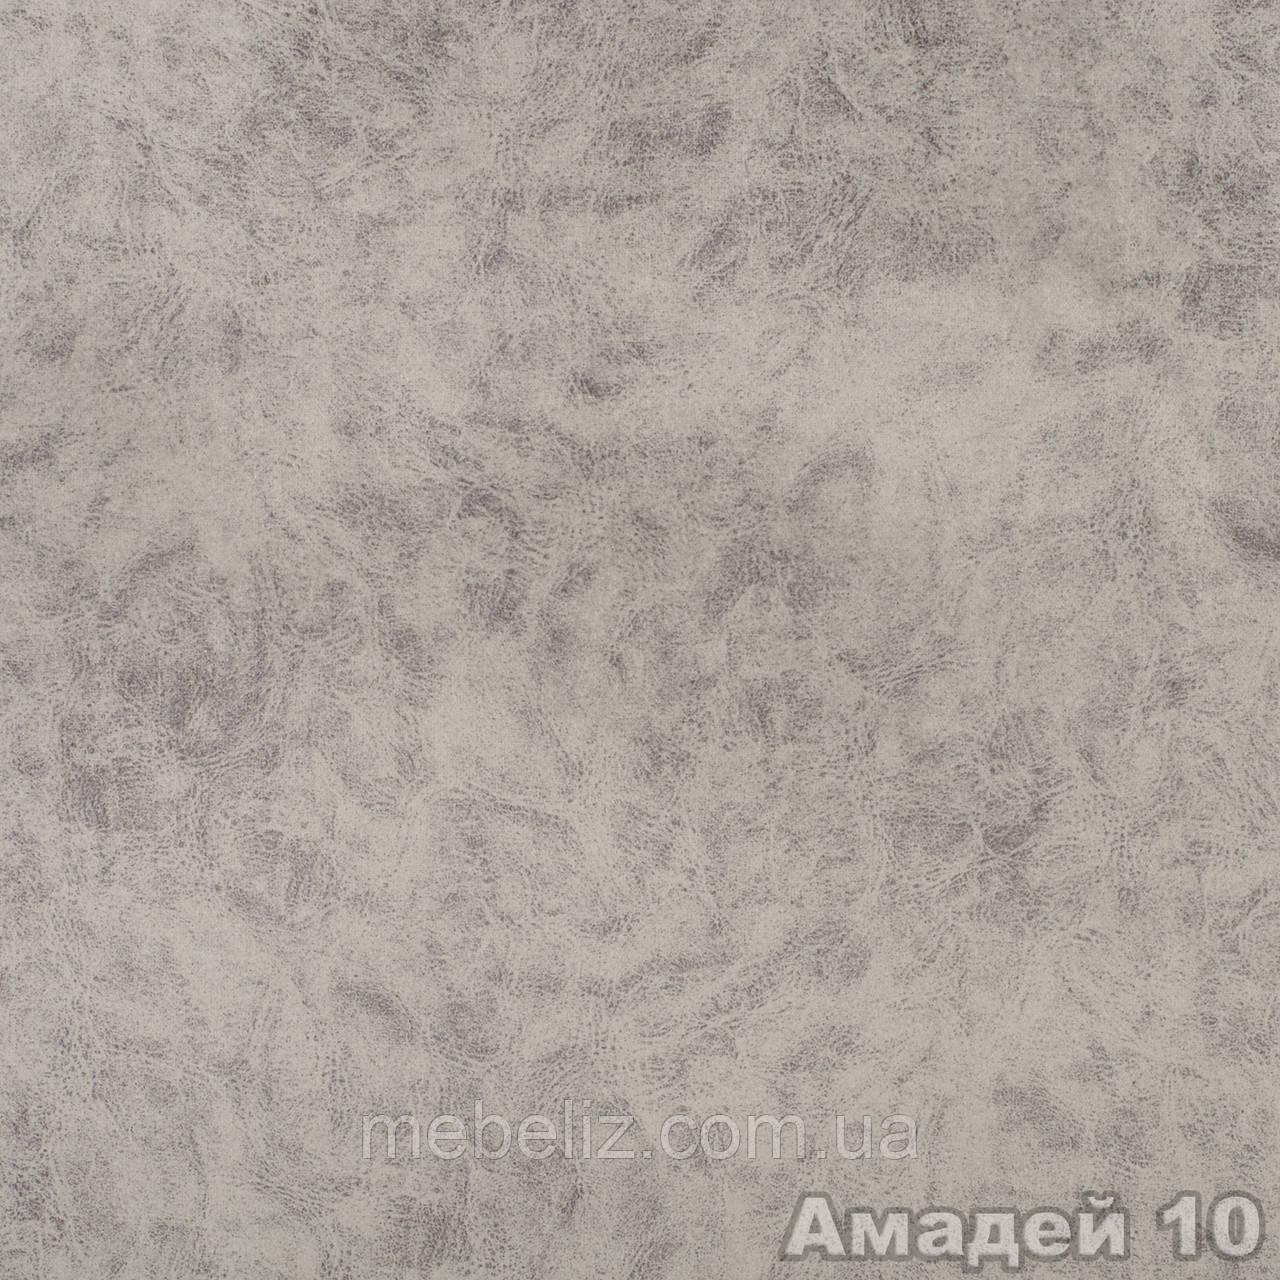 Тканина меблева для оббивки Амадей 10